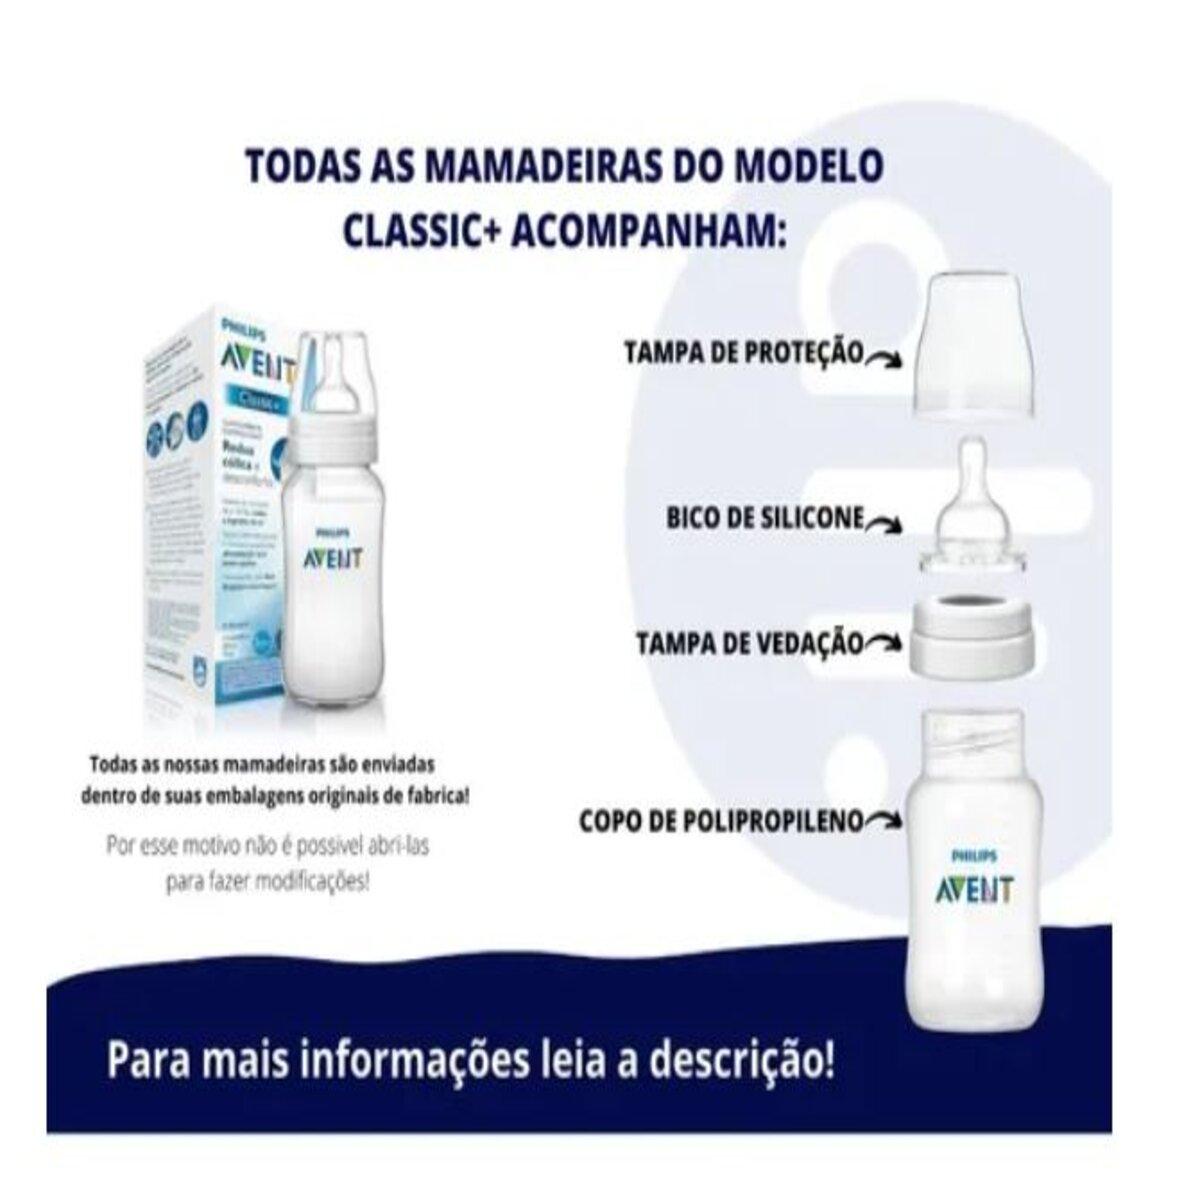 Mamadeira Philips Avent 330ml Classic Anticólica - Azul